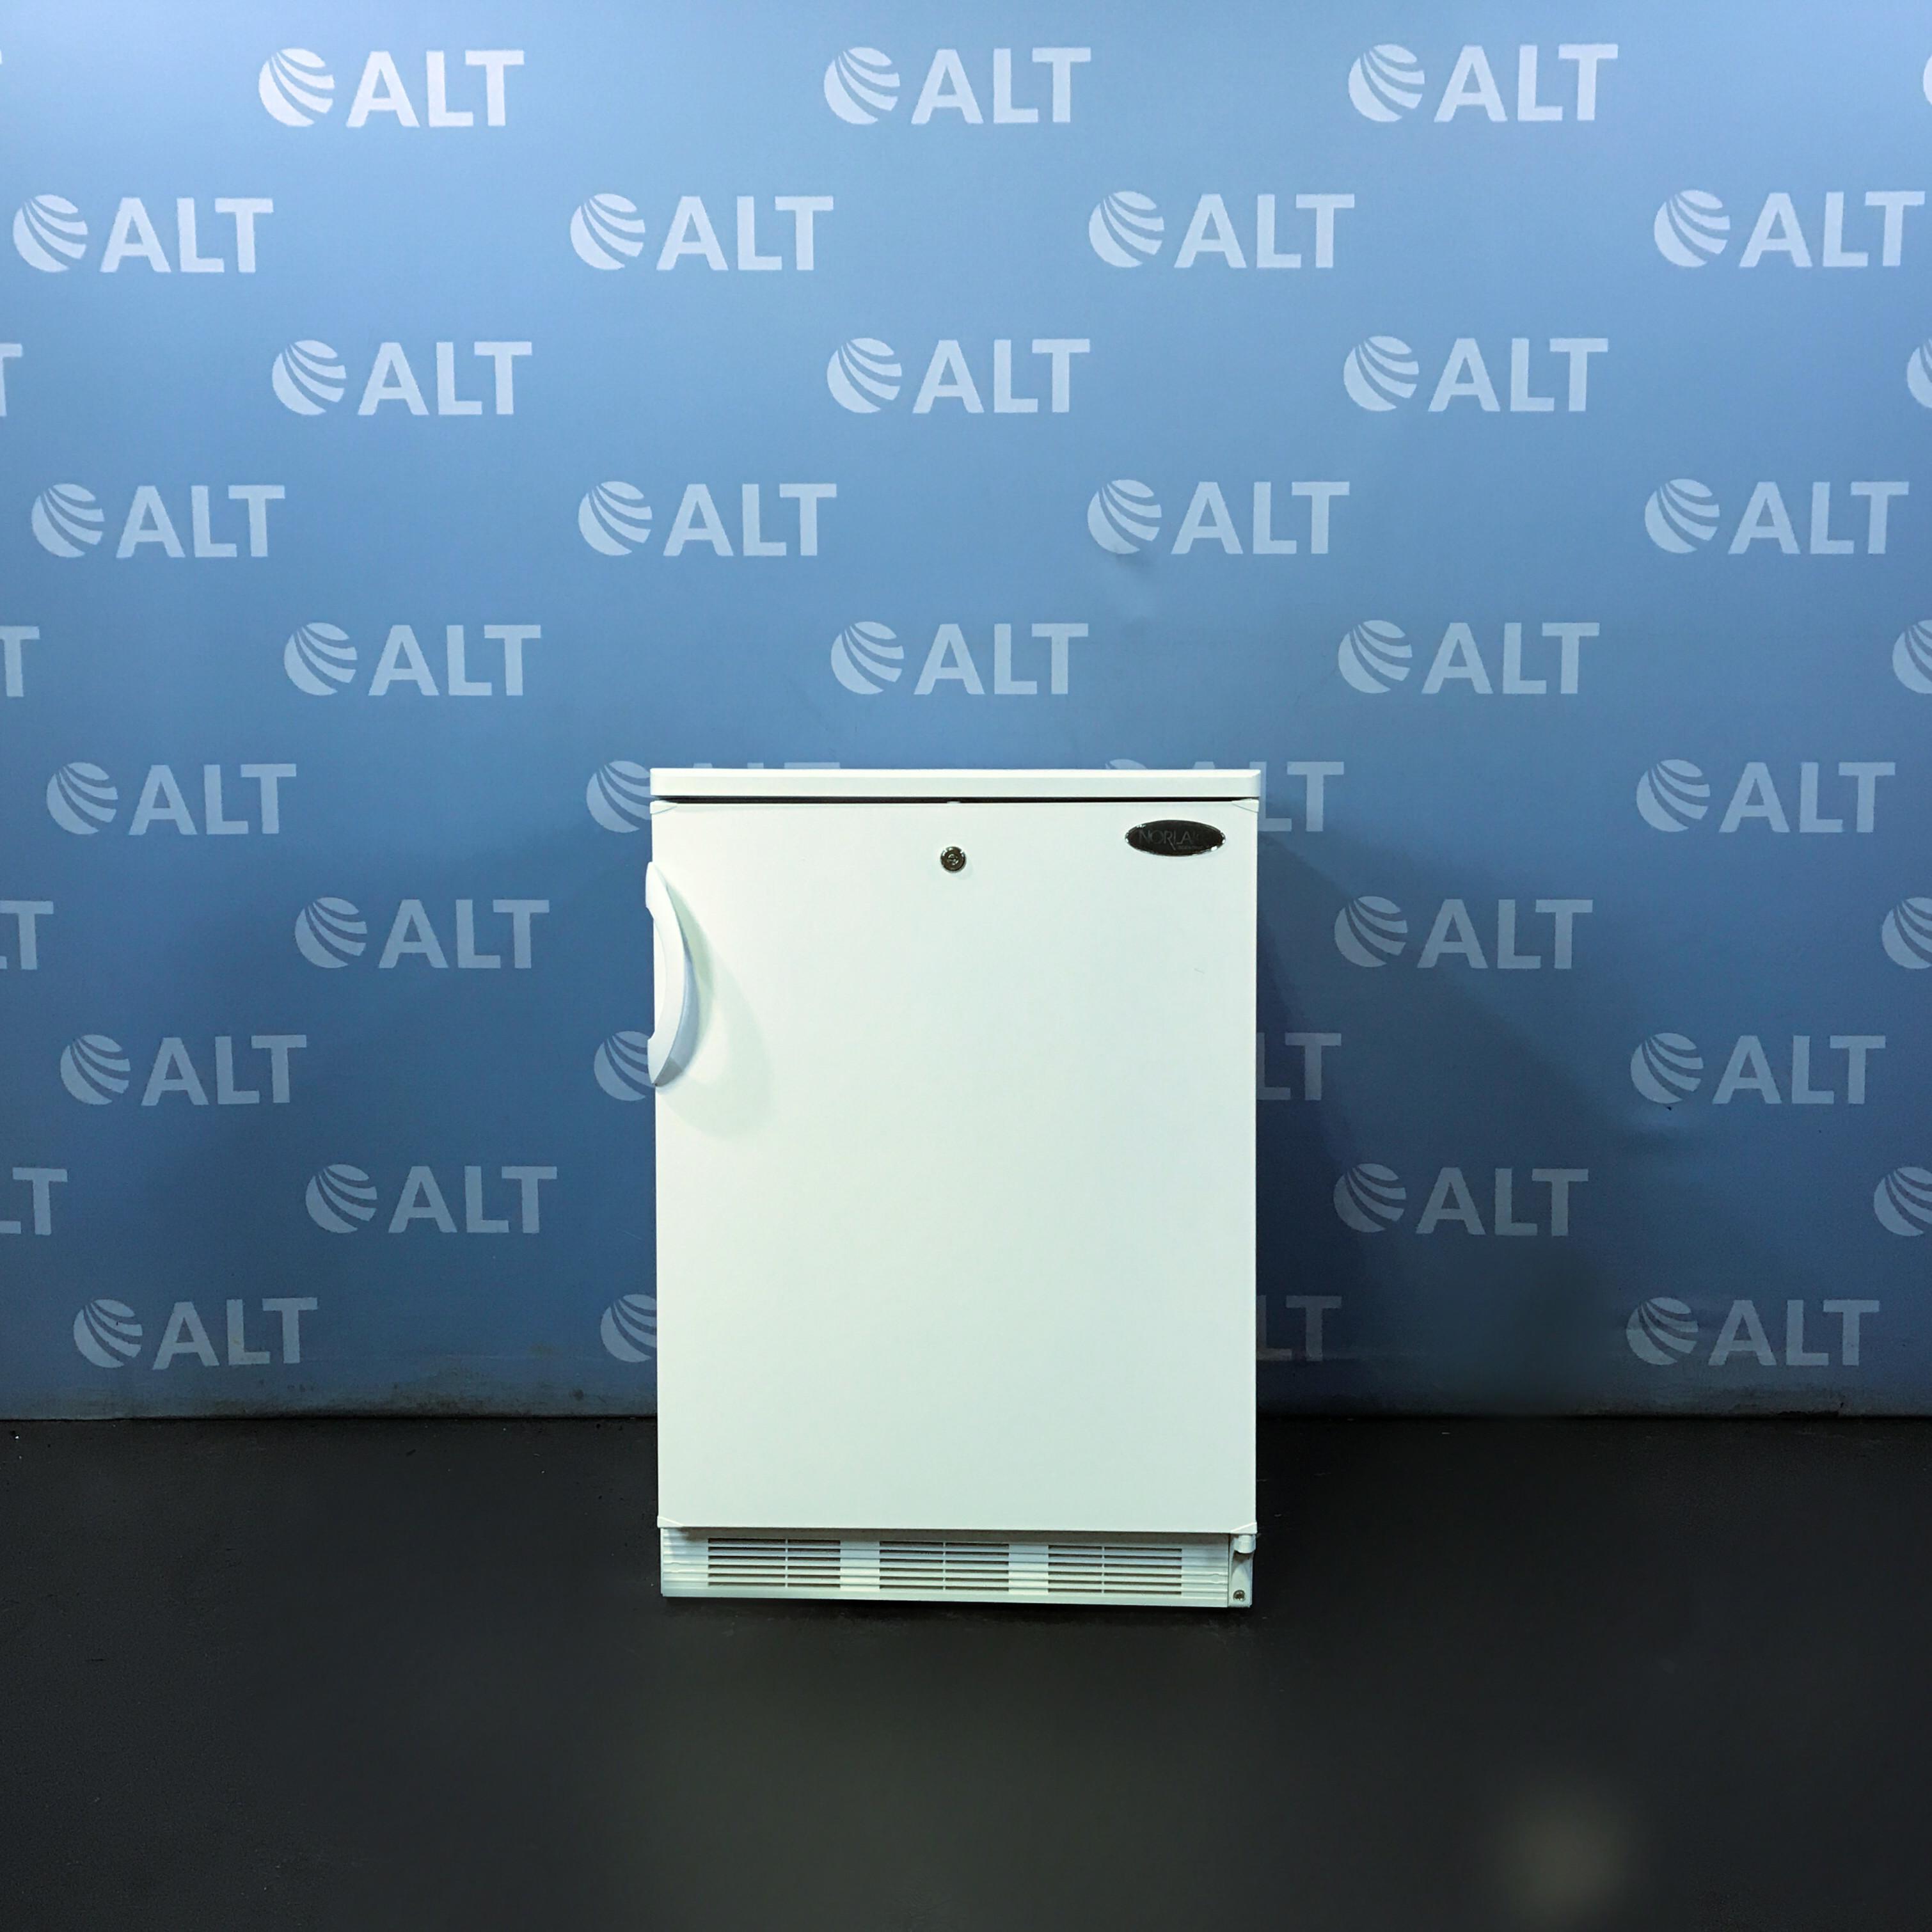 VWR Undercounter Refrigerator/Freezer CAT No. 97007-240 Image